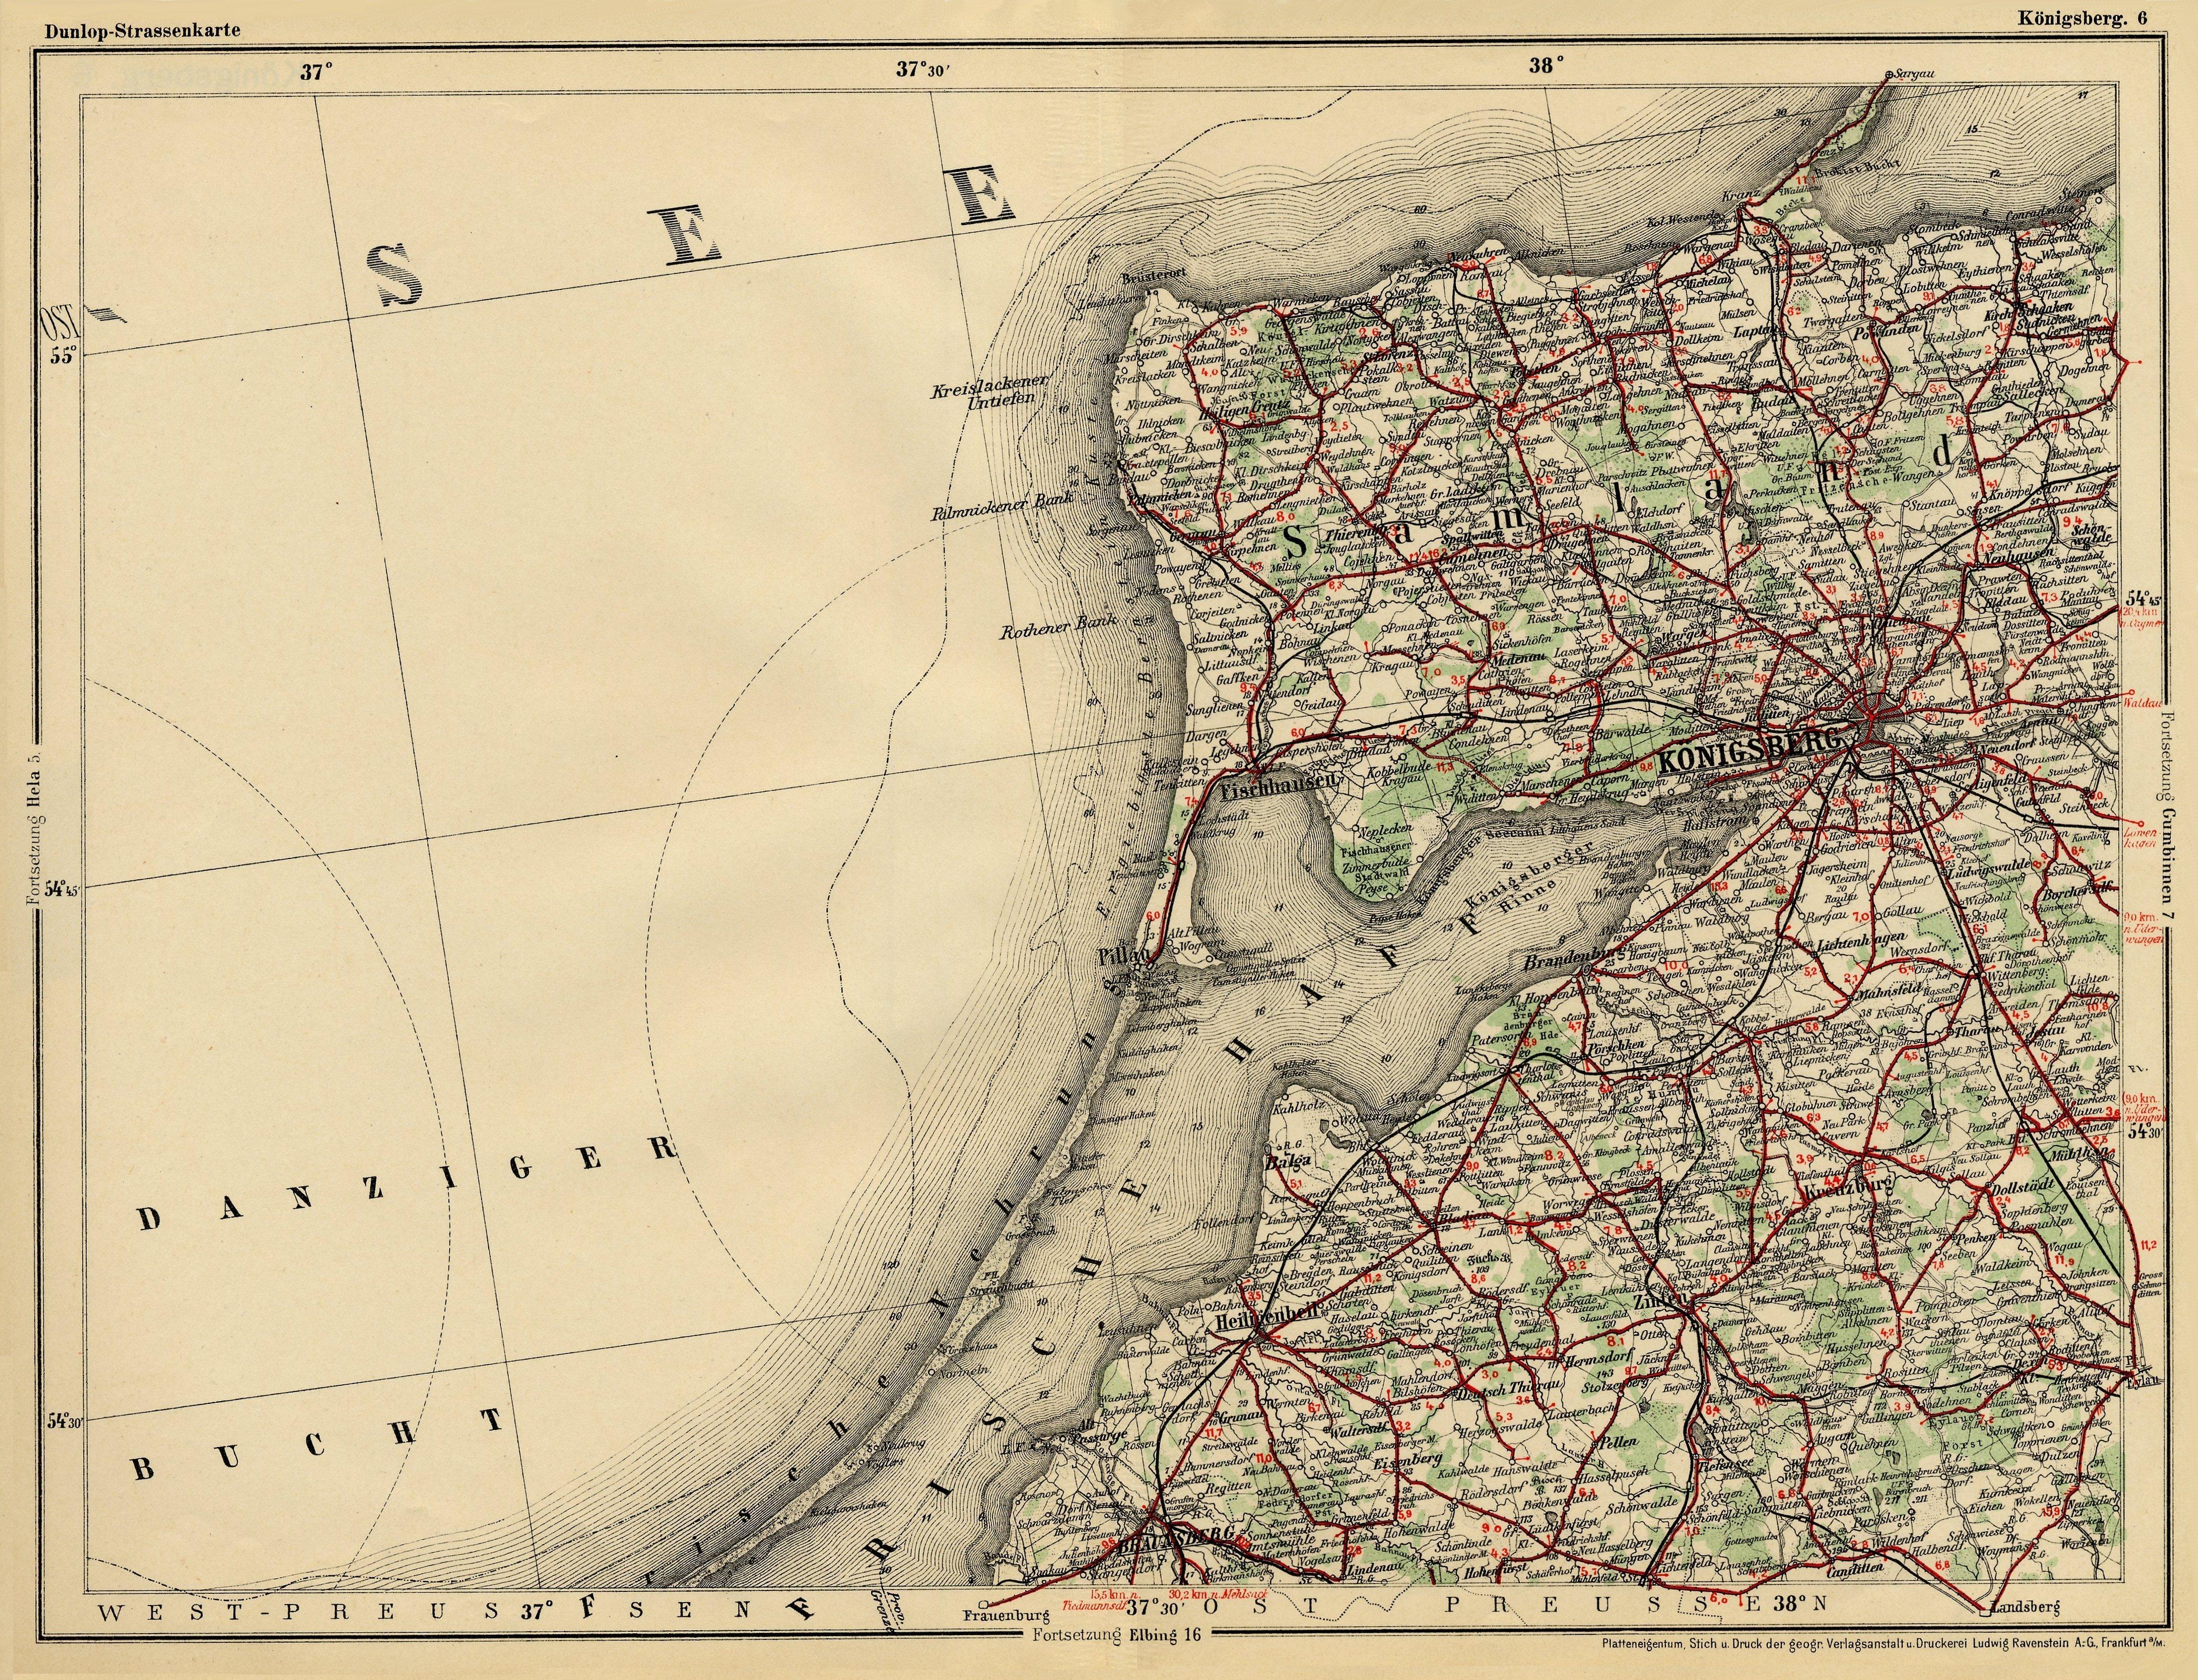 Königsberg Kaliningrad Karte.The Internet Polish Genealogical Source